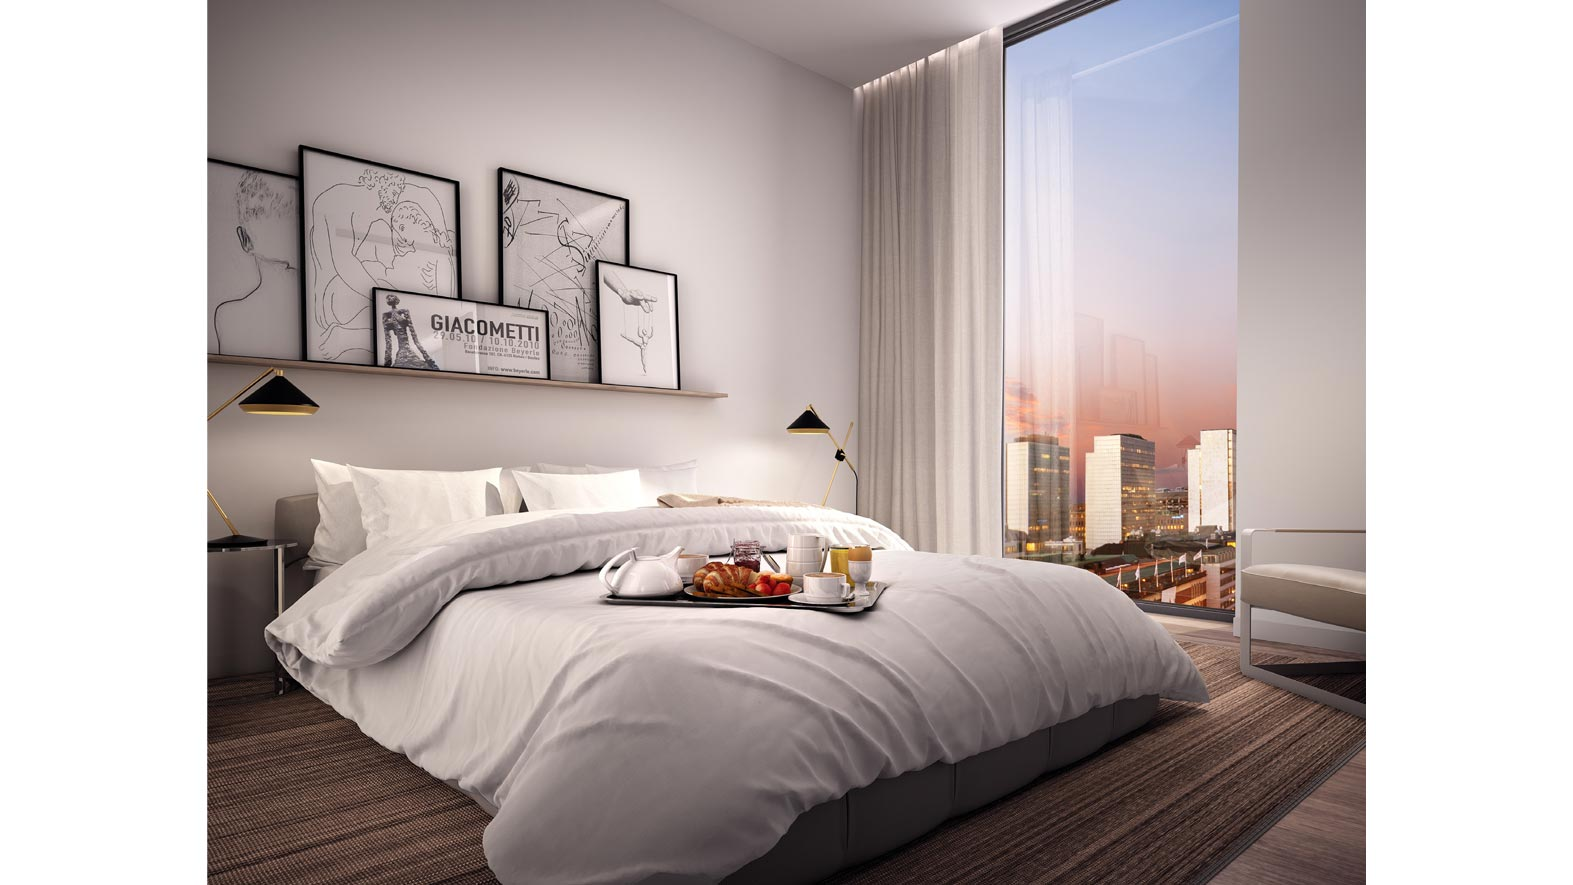 stockholm-most-expensive-apartment-lauren-blog-4.jpg